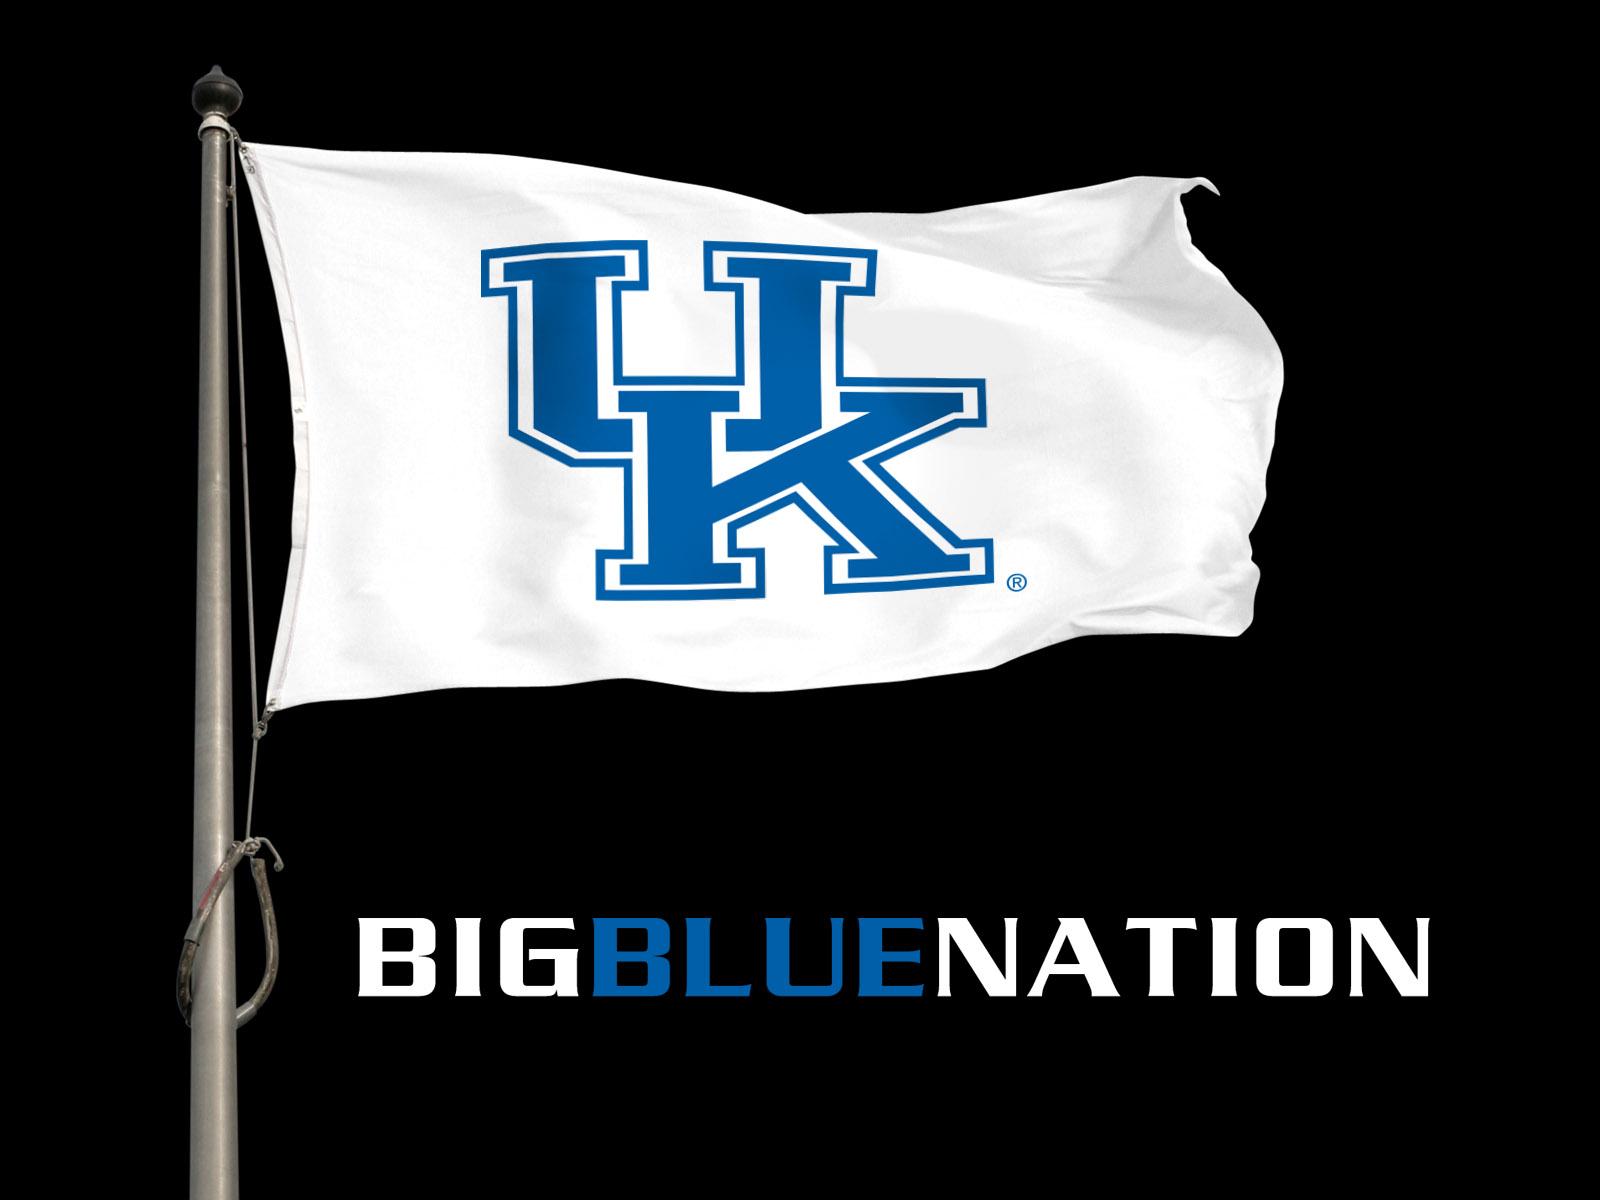 Kentucky Wallpaper Wildcat Uk Basketball Free Image